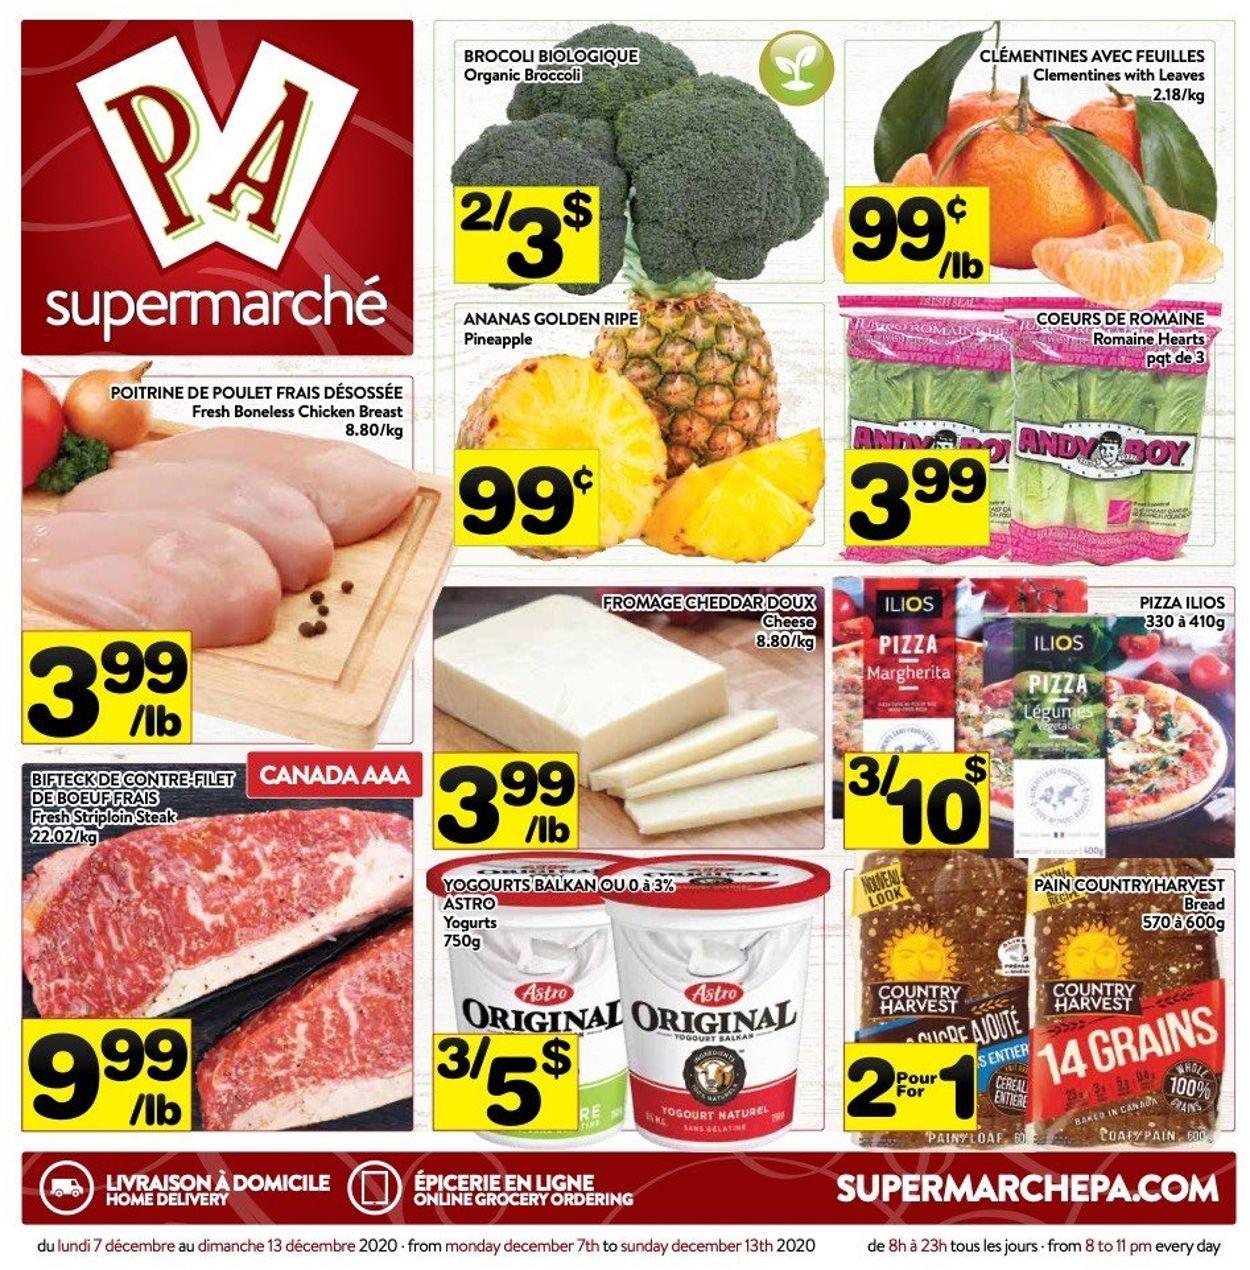 PA Supermarché - Holiday 2020 Flyer - 12/07-12/13/2020